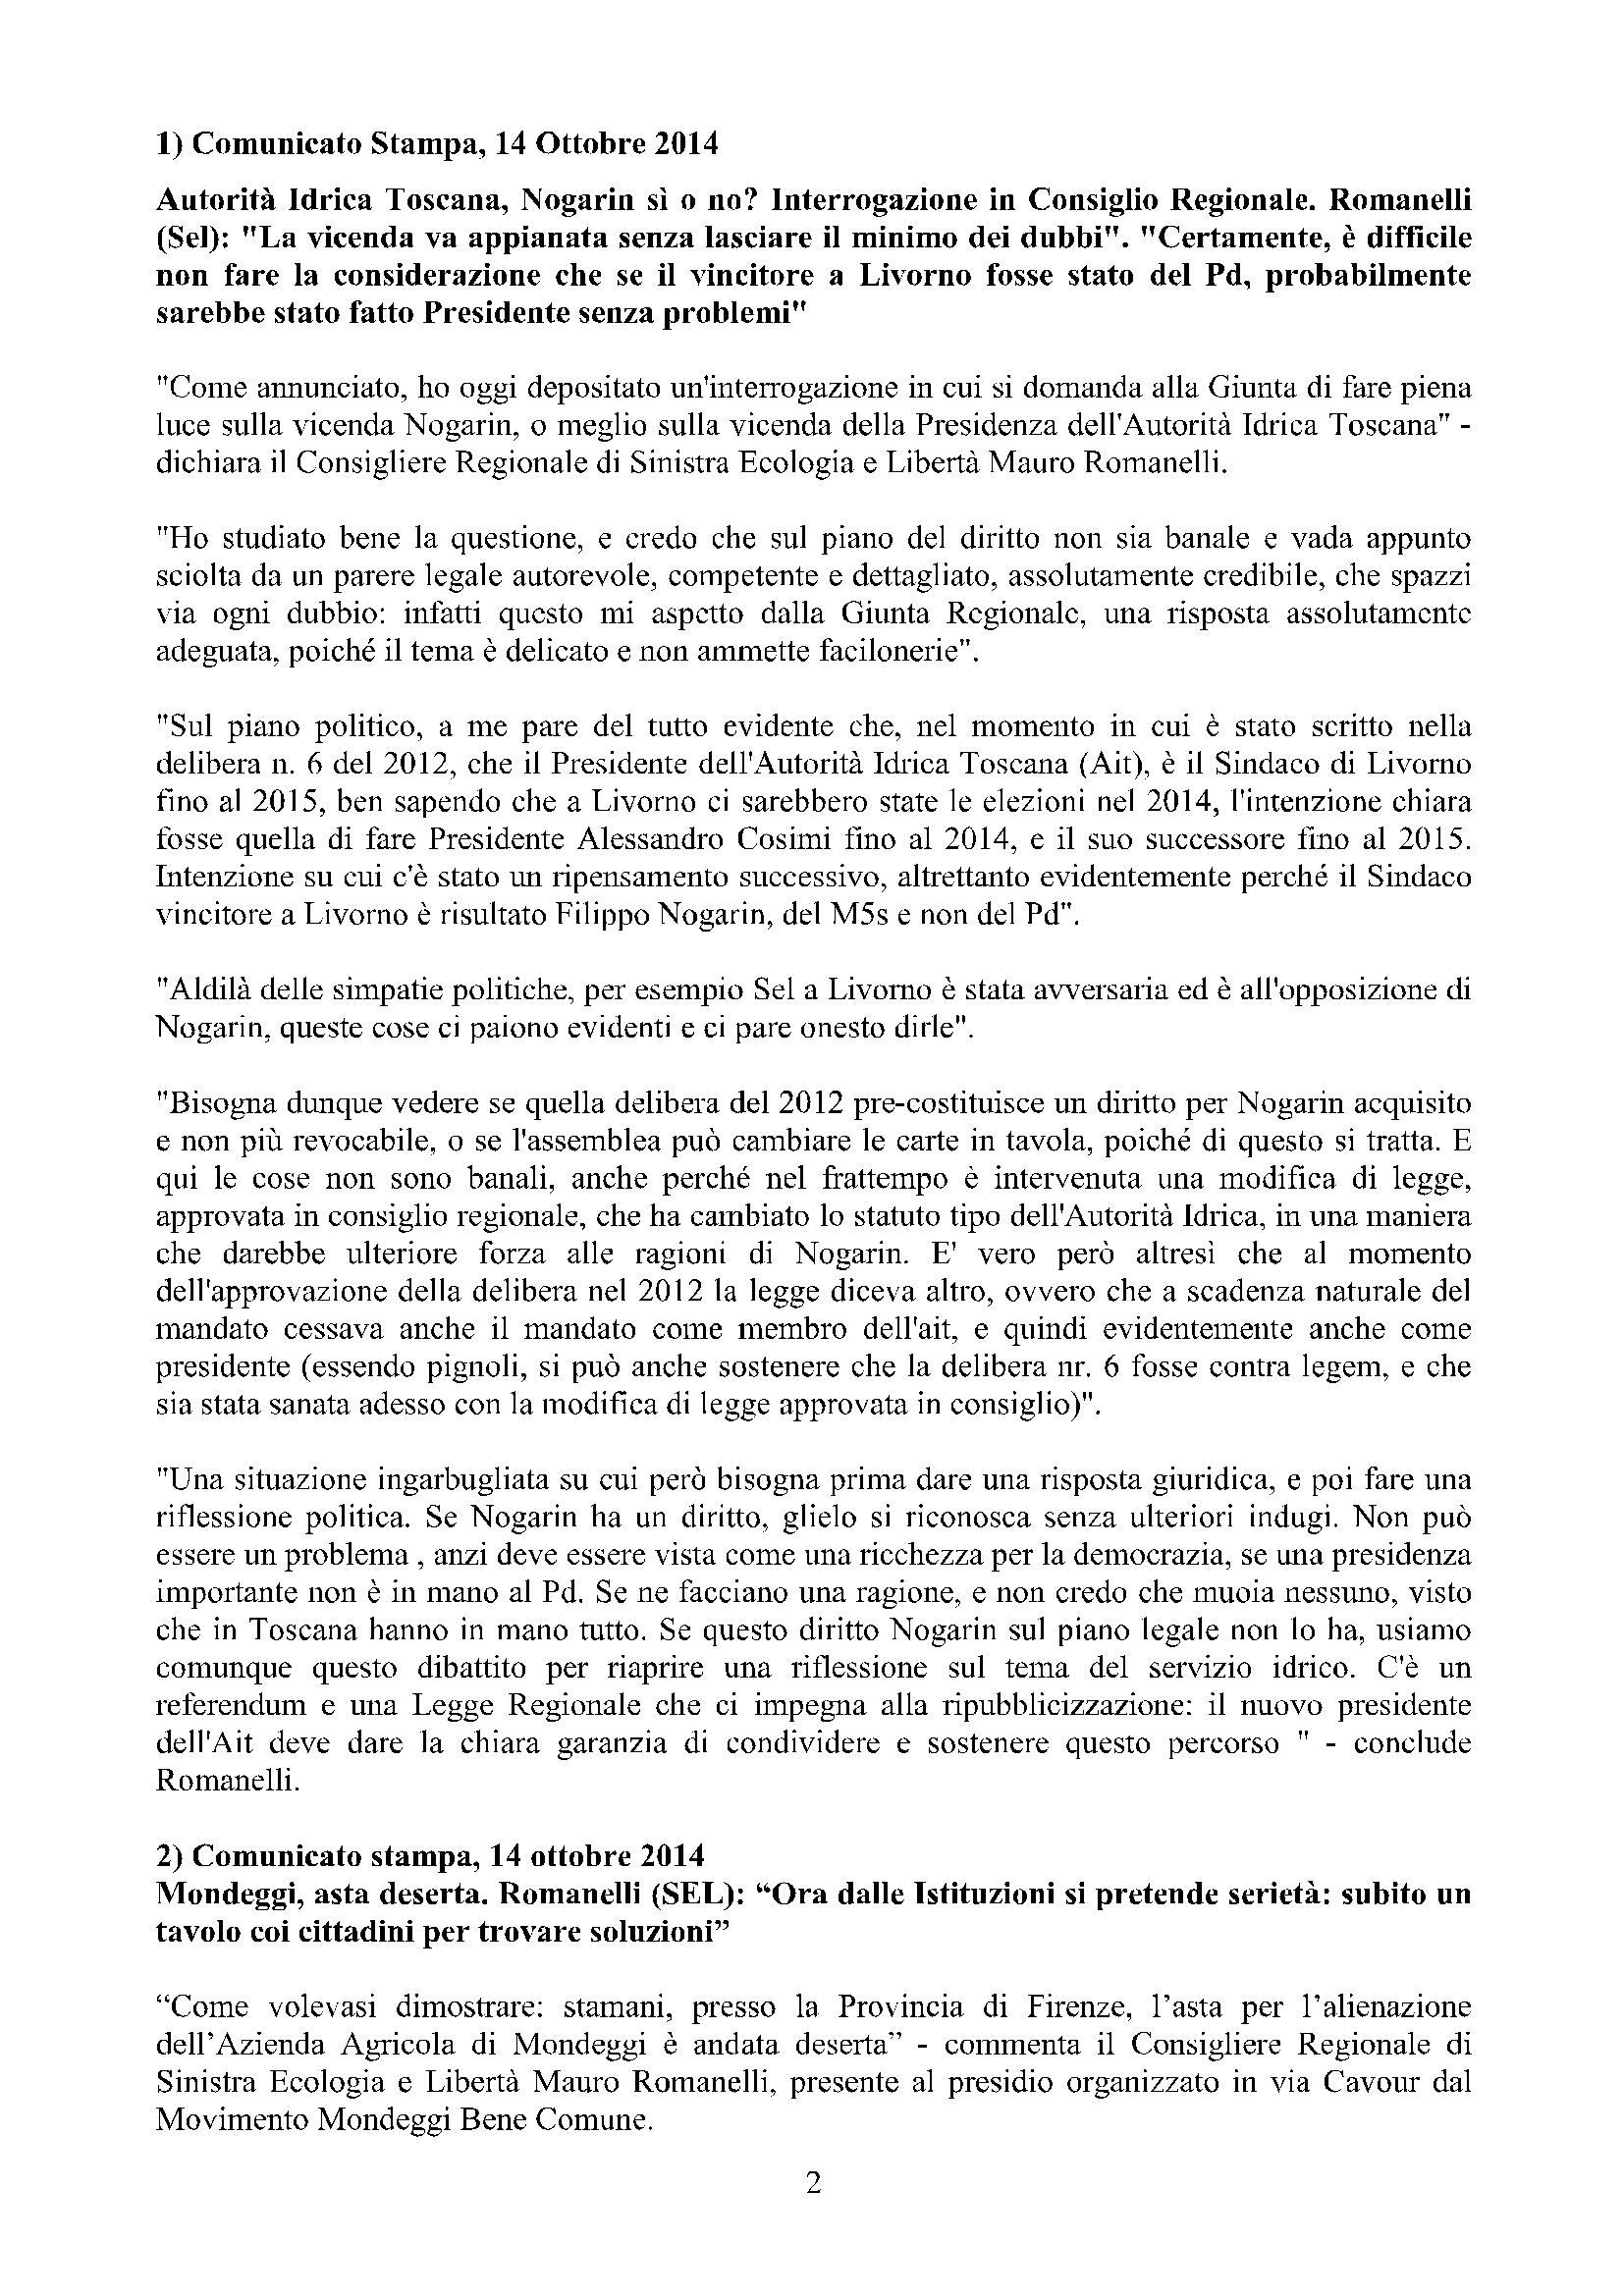 Newsletter di MAURO ROMANELLI Ottobre 2014 – 2